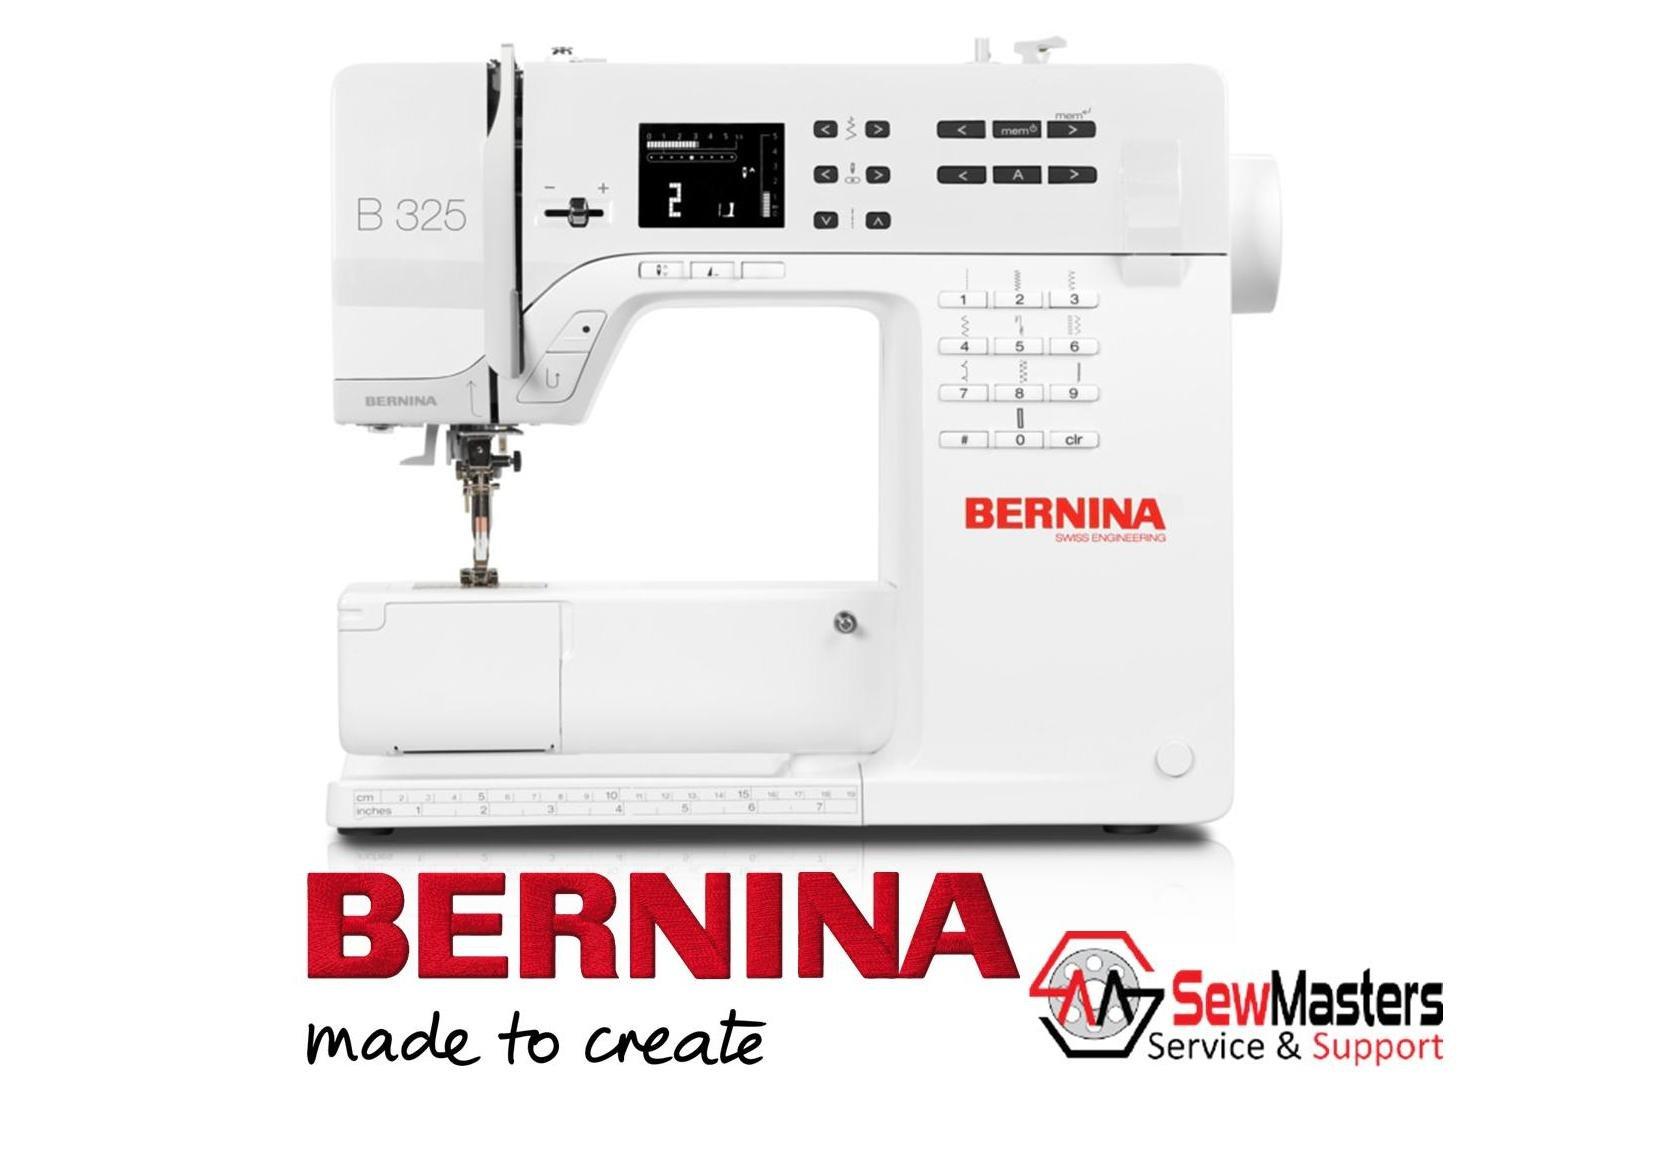 Bernina B325 Sewing Machine - SewMasters Sewing Machines